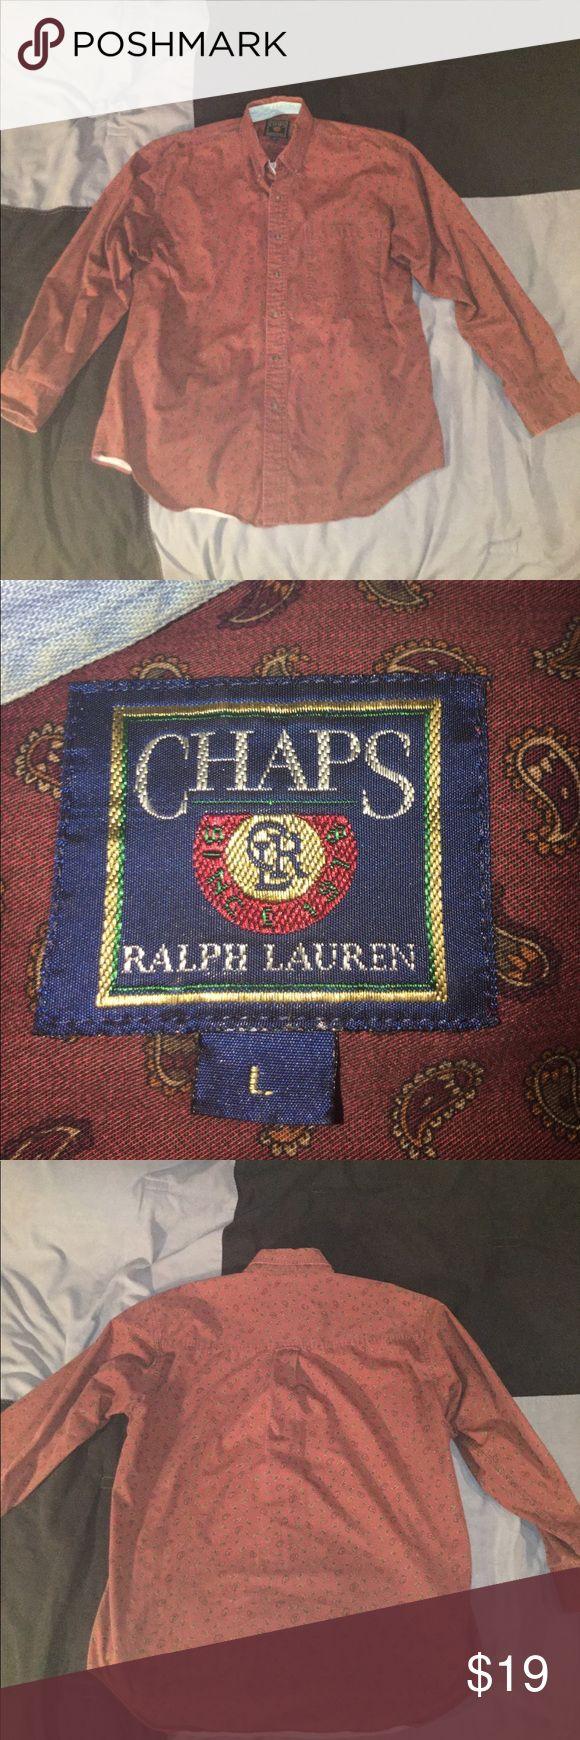 Men's Chaps By Ralph Lauren Dress Shirt Size L Excellent Condition ||| Men's Chaps By Ralph Lauren Size L Chaps Shirts Dress Shirts